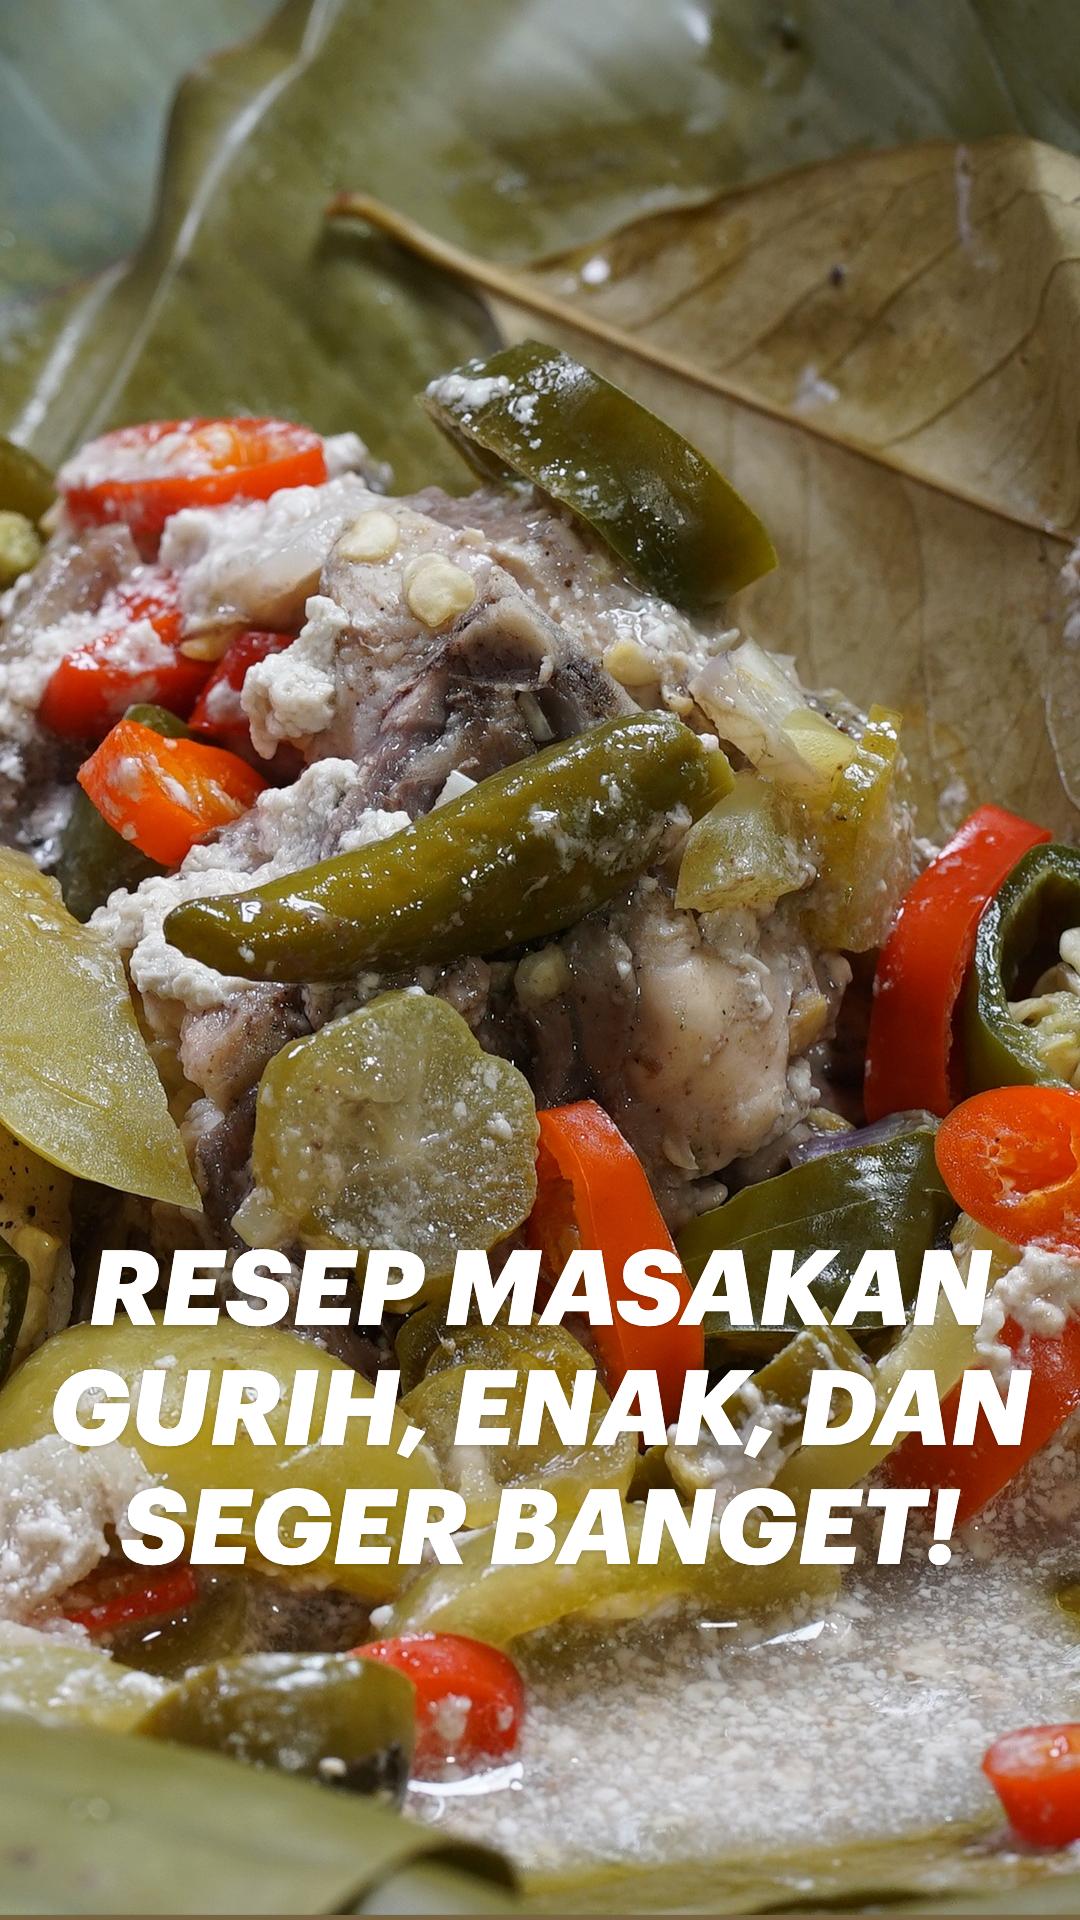 Resep Masakan Gurih Enak Dan Seger Banget An Immersive Guide By Tastemade Indonesia